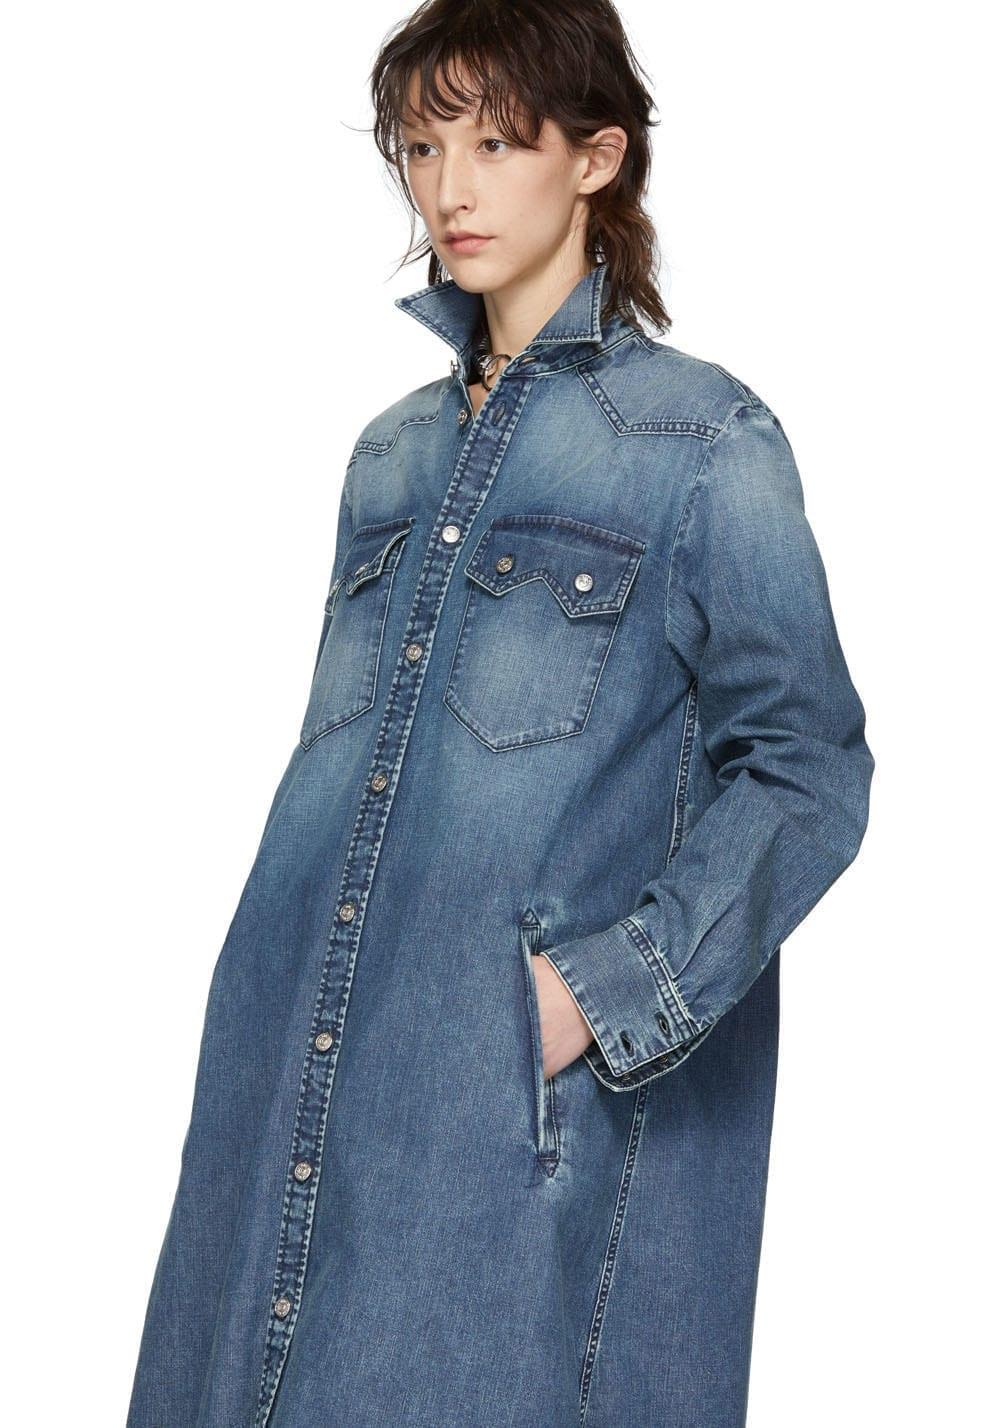 MM6 MAISON MARGIELA Button-Up Denim Blue Dress